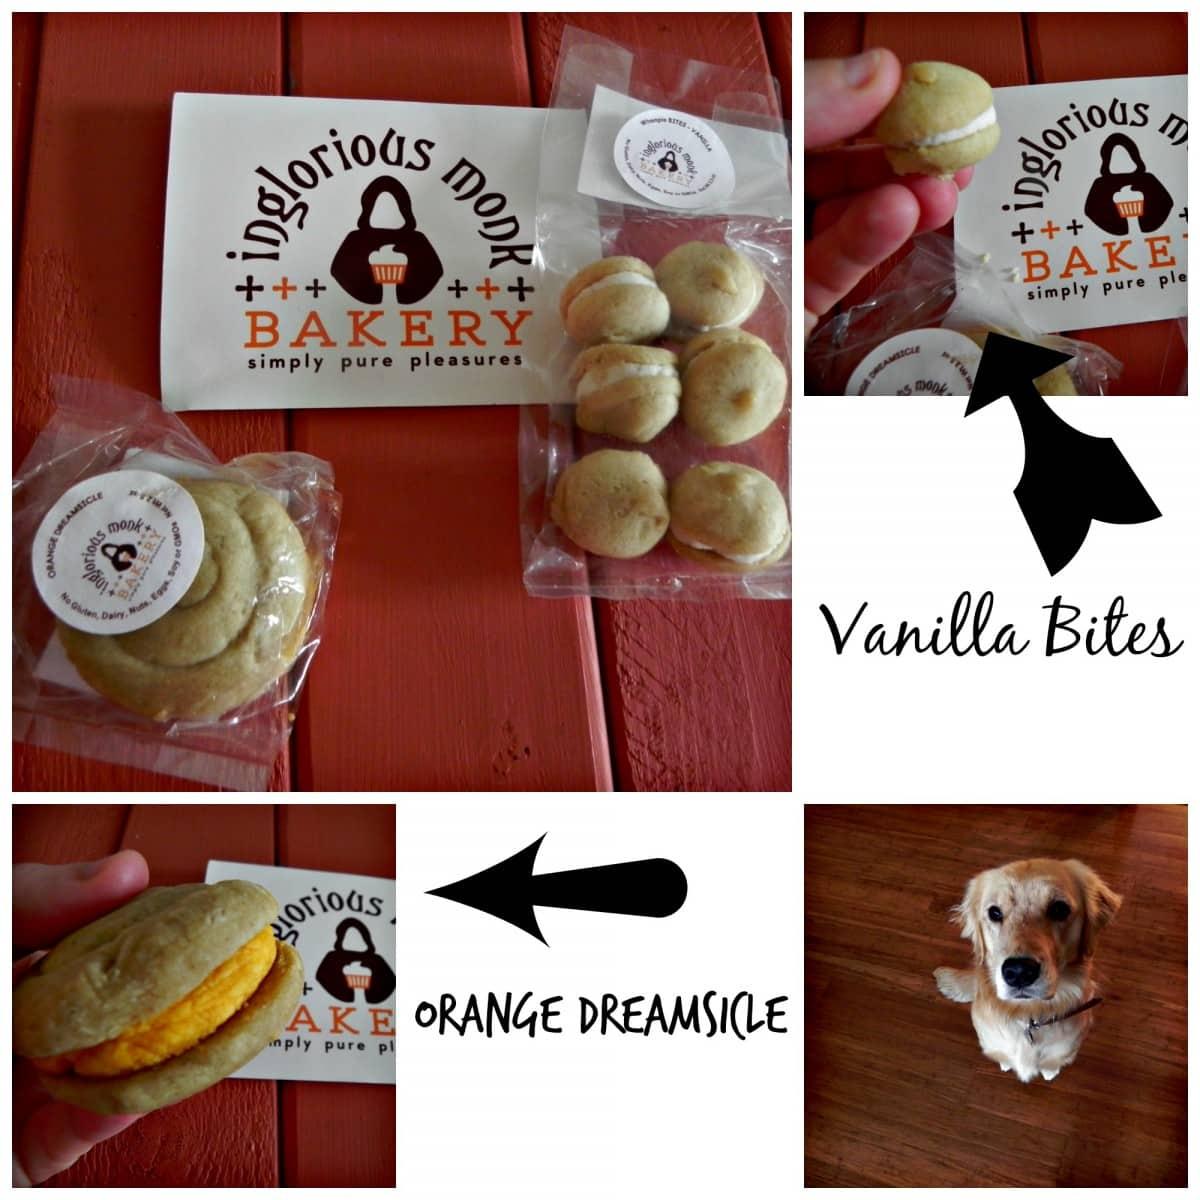 I Monk Bakery #review vegetarianmamma.com